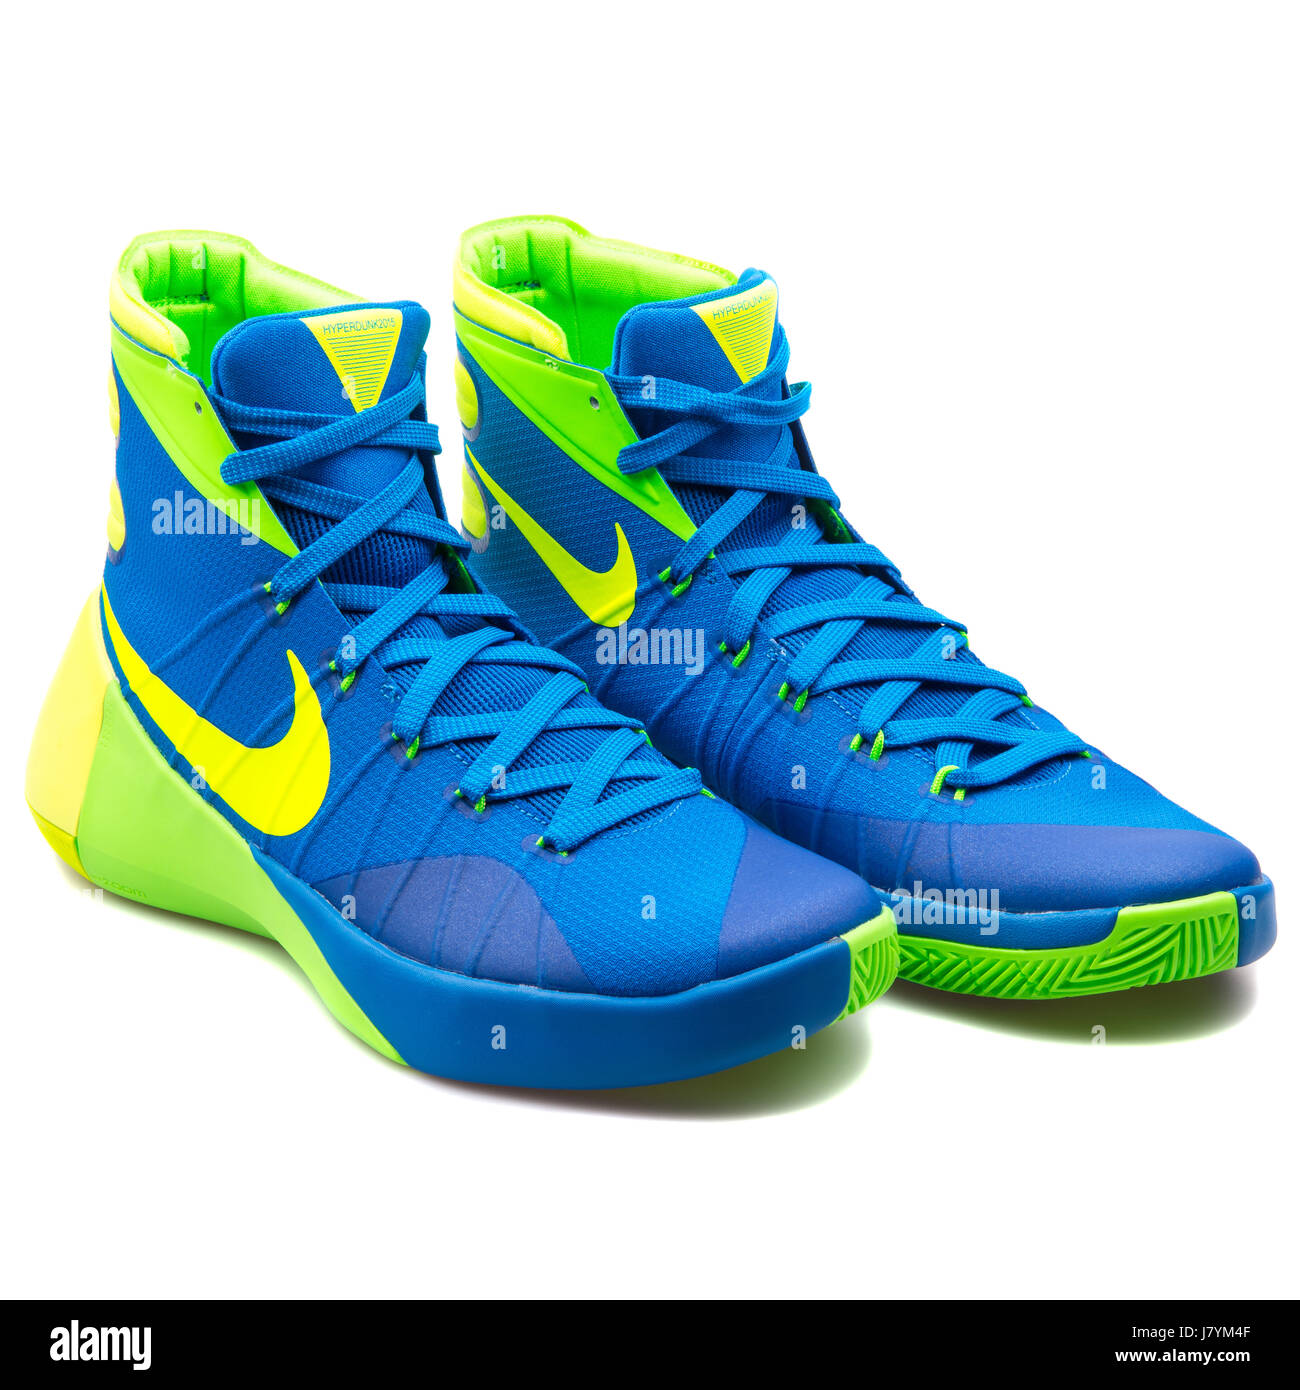 new concept 6b1db 516cc usa nike hyperdunk 2015 uomini blu giallo e verde basketball sneakers  749561 473 immagini stock 70aa6